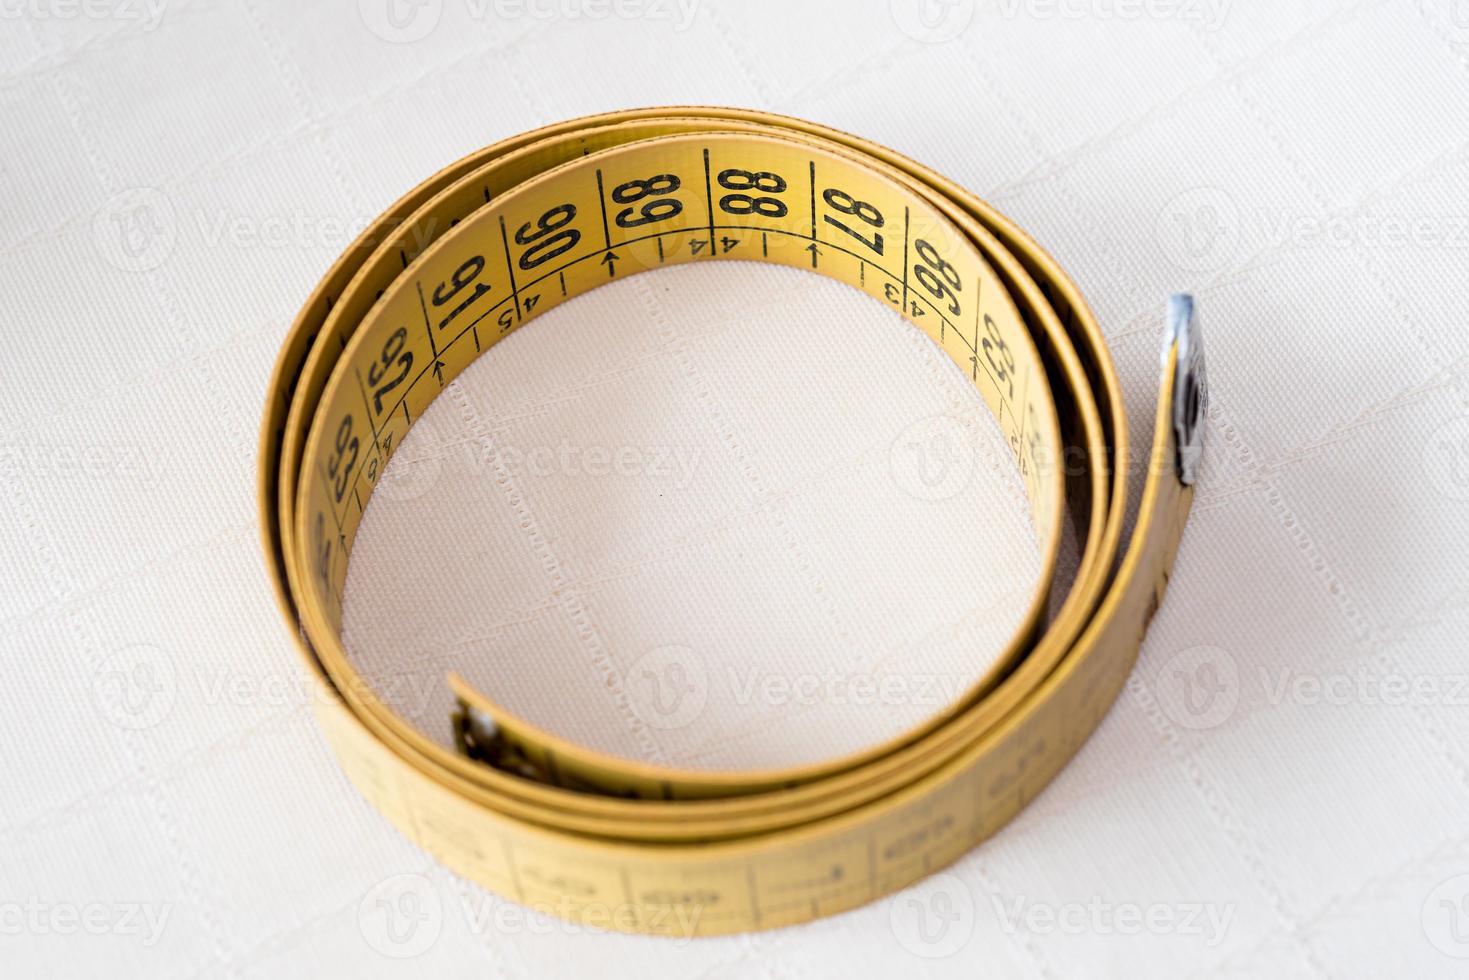 Measuring tape photo